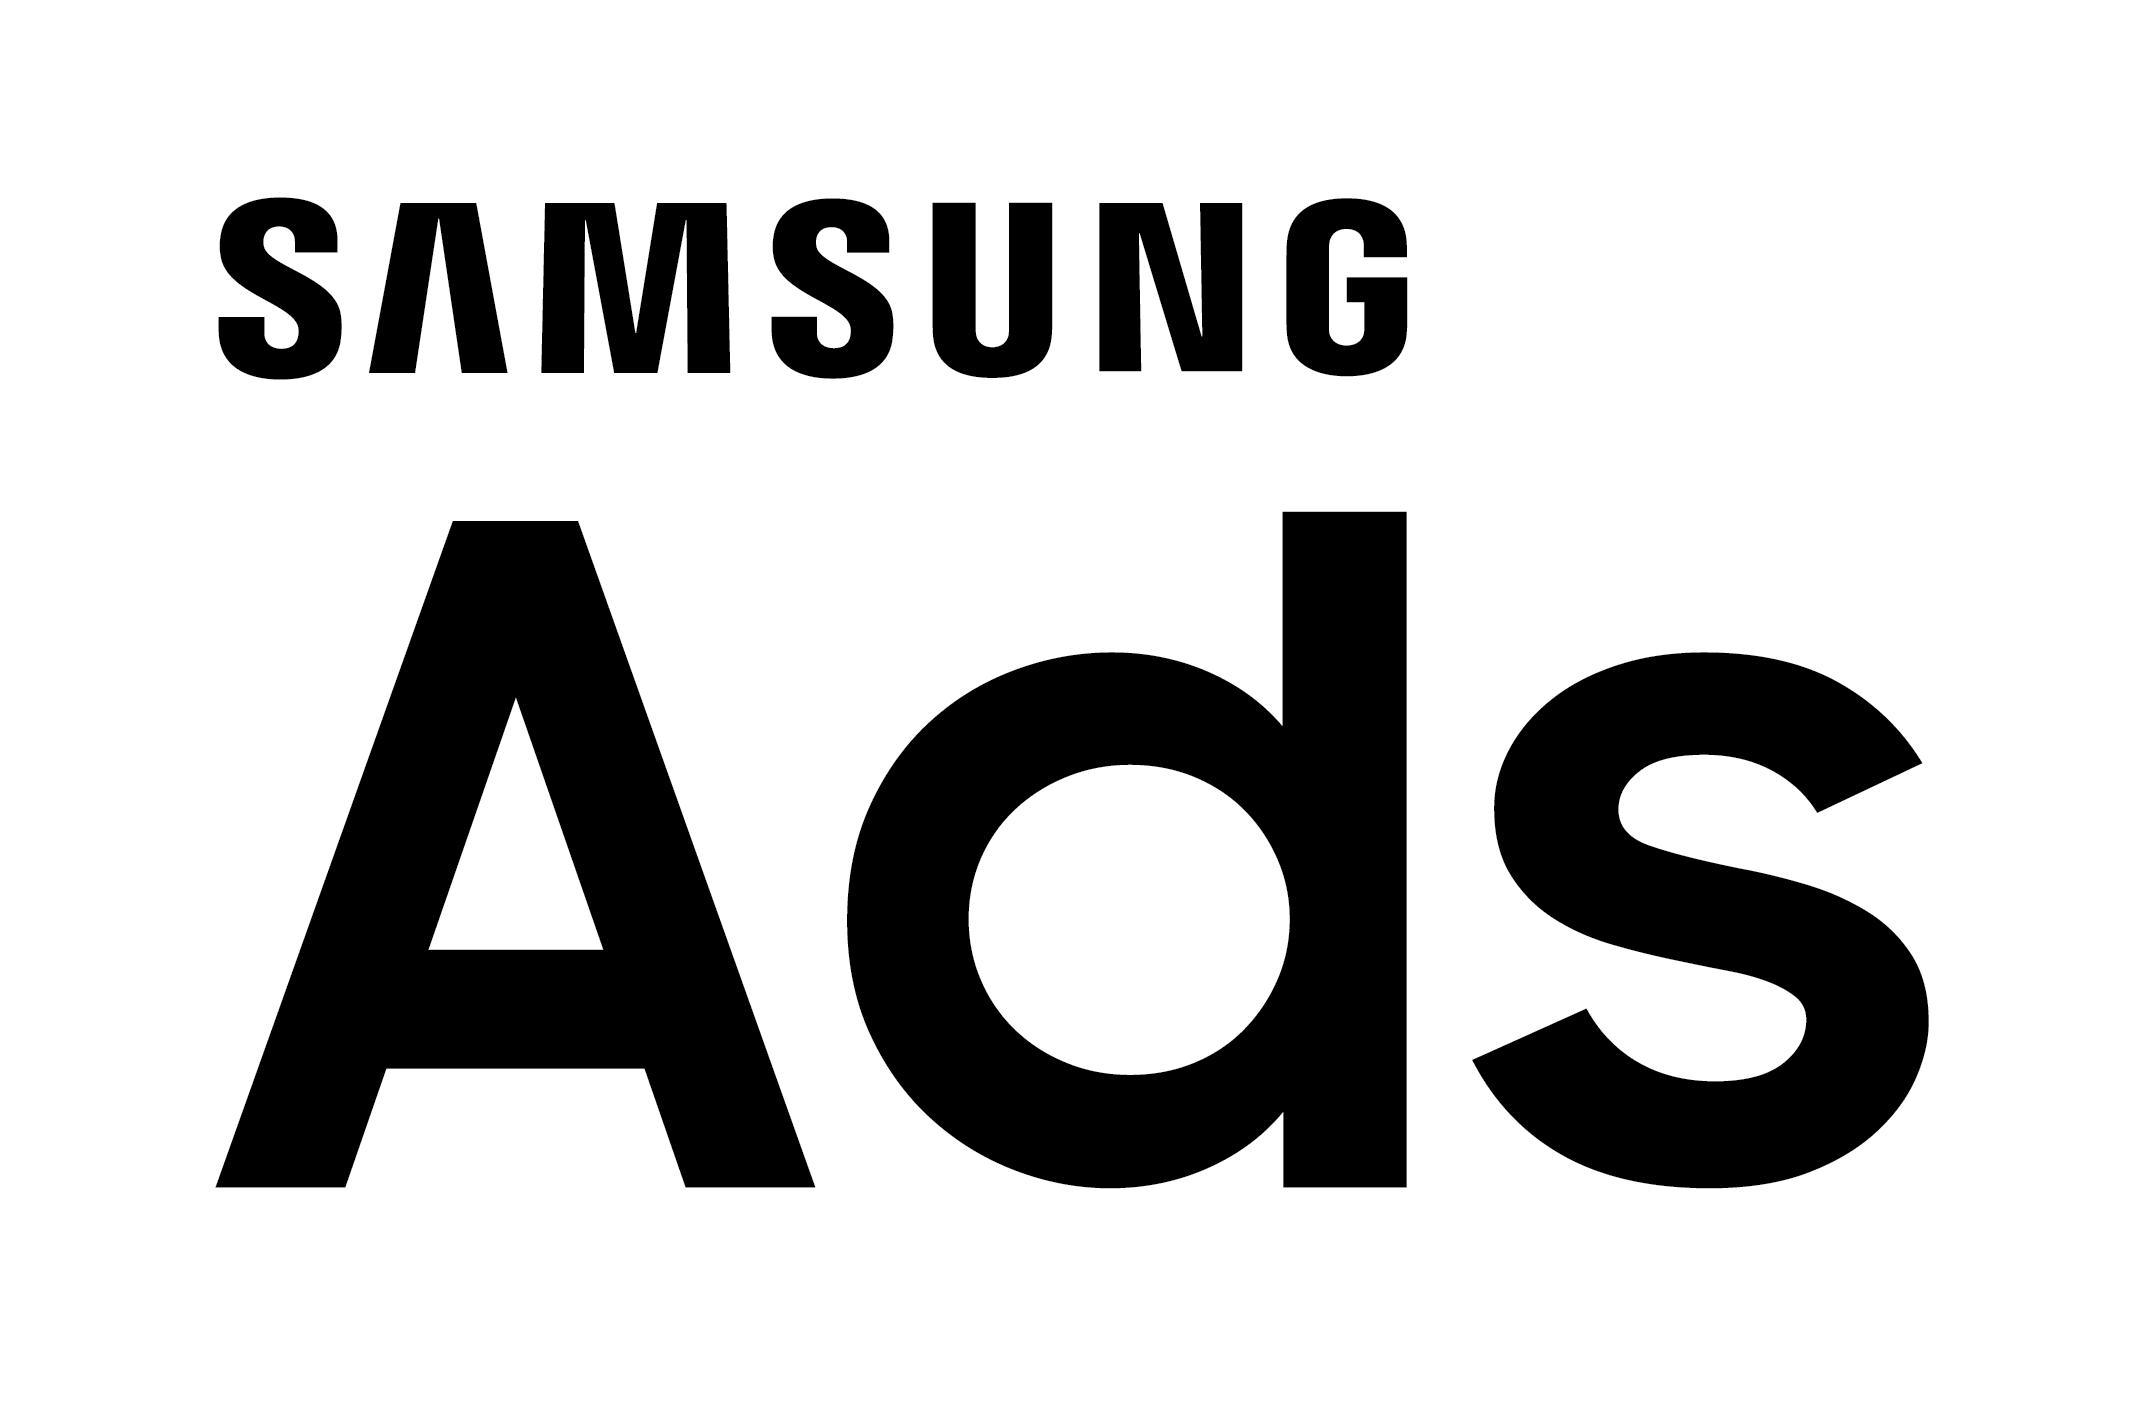 https://www.samsung.com/us/business/samsungads/